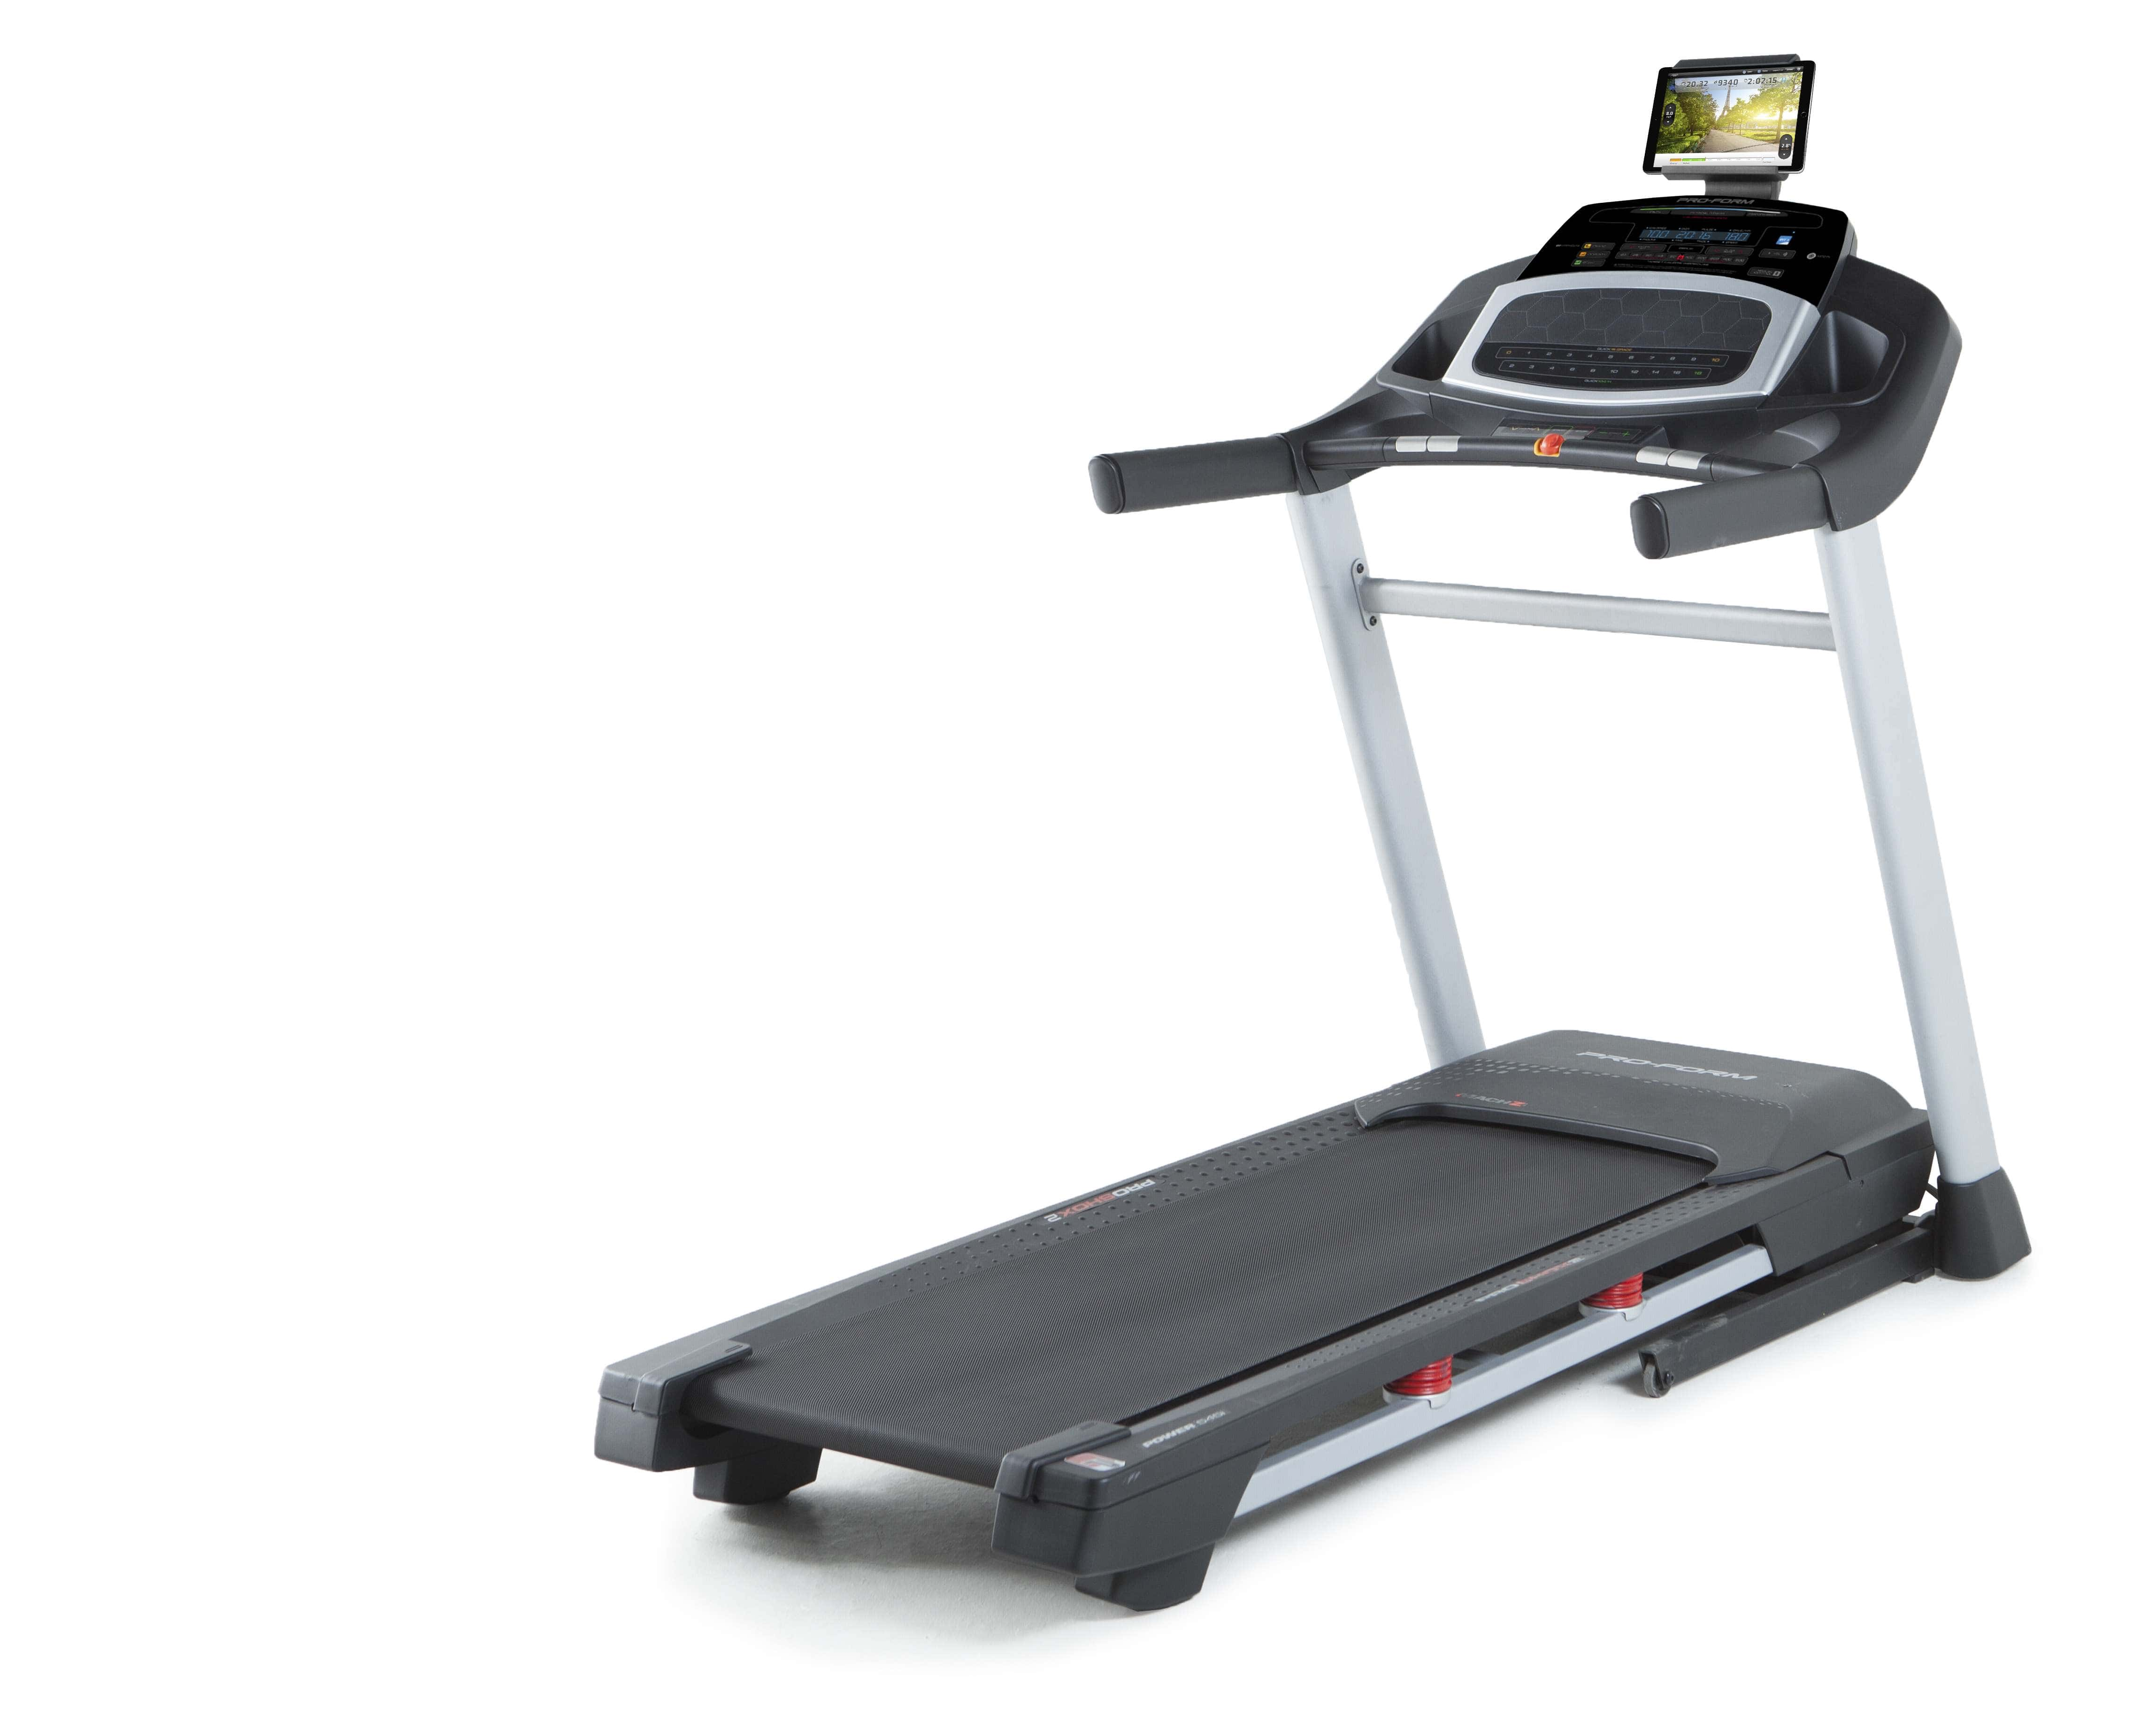 Proform Treadmills Power 545i  gallery image 2